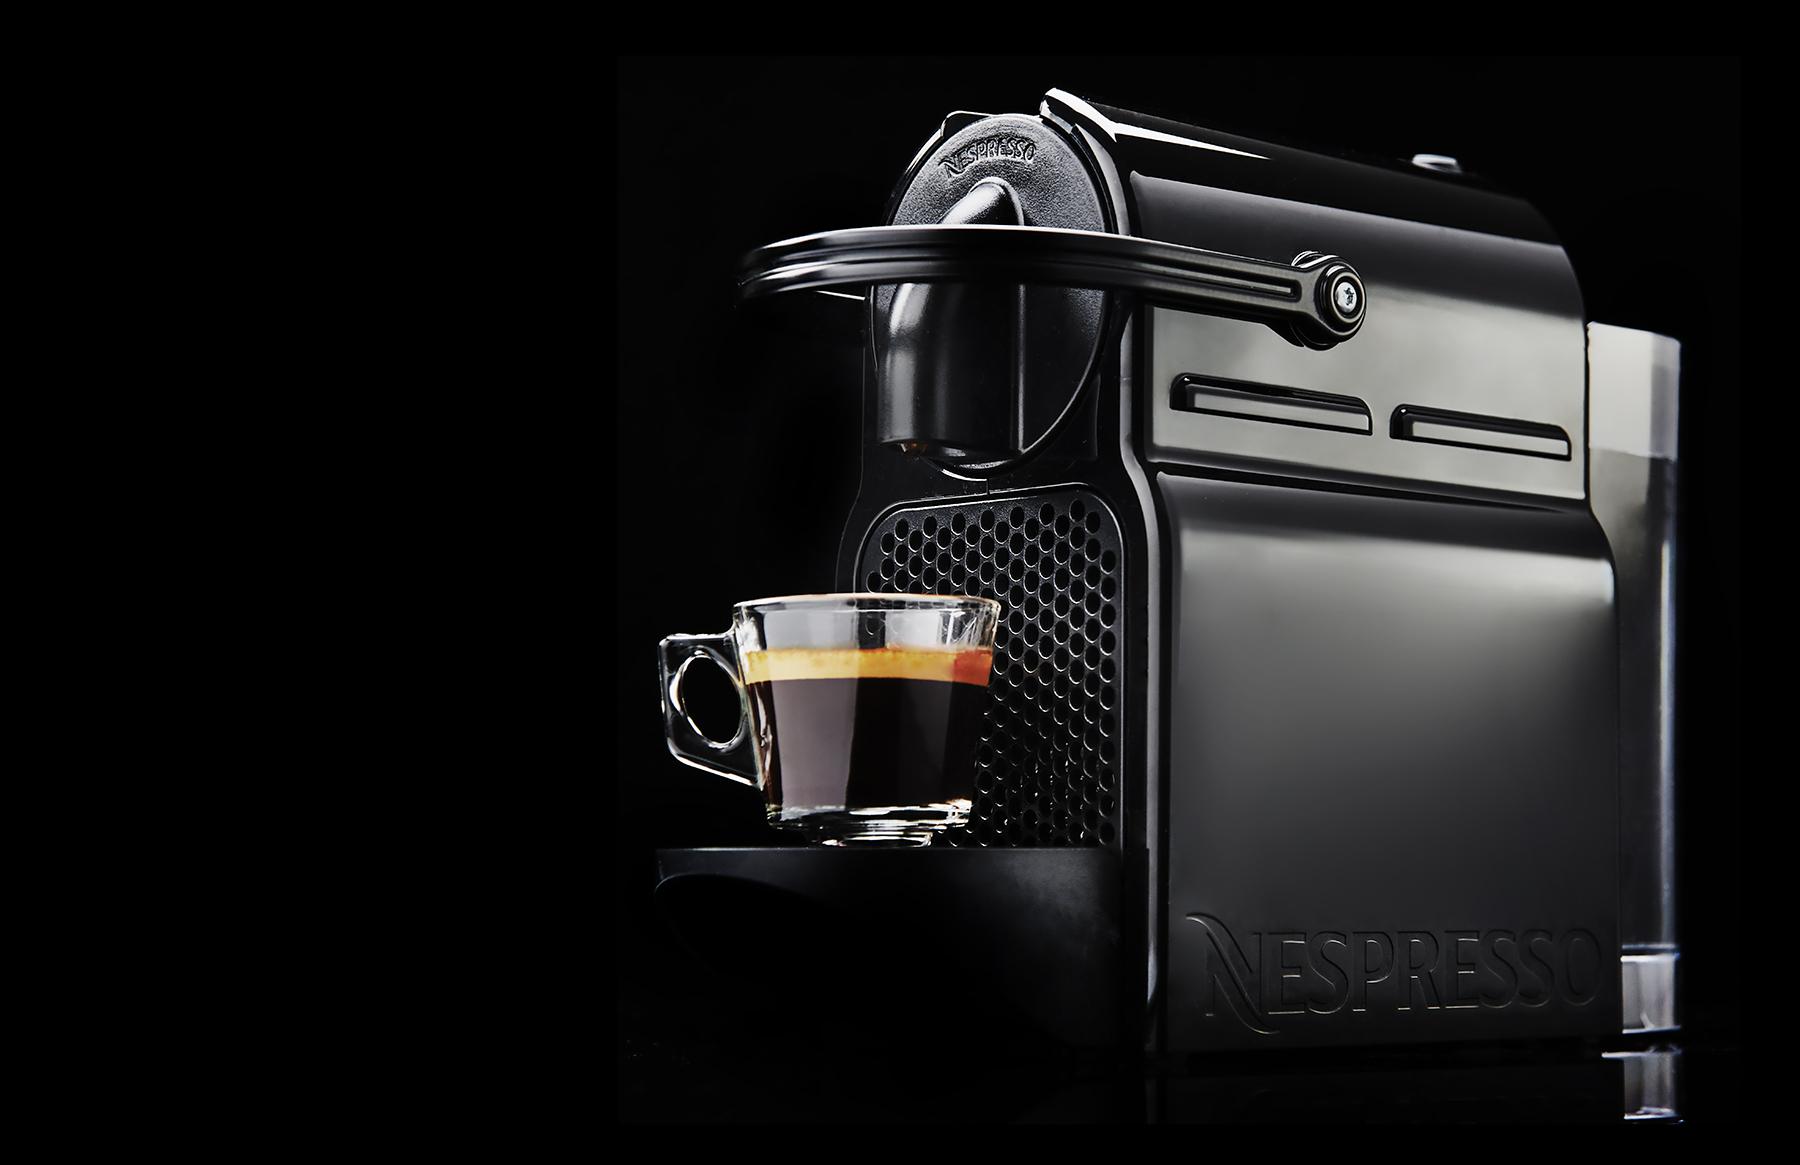 NespressoFull2